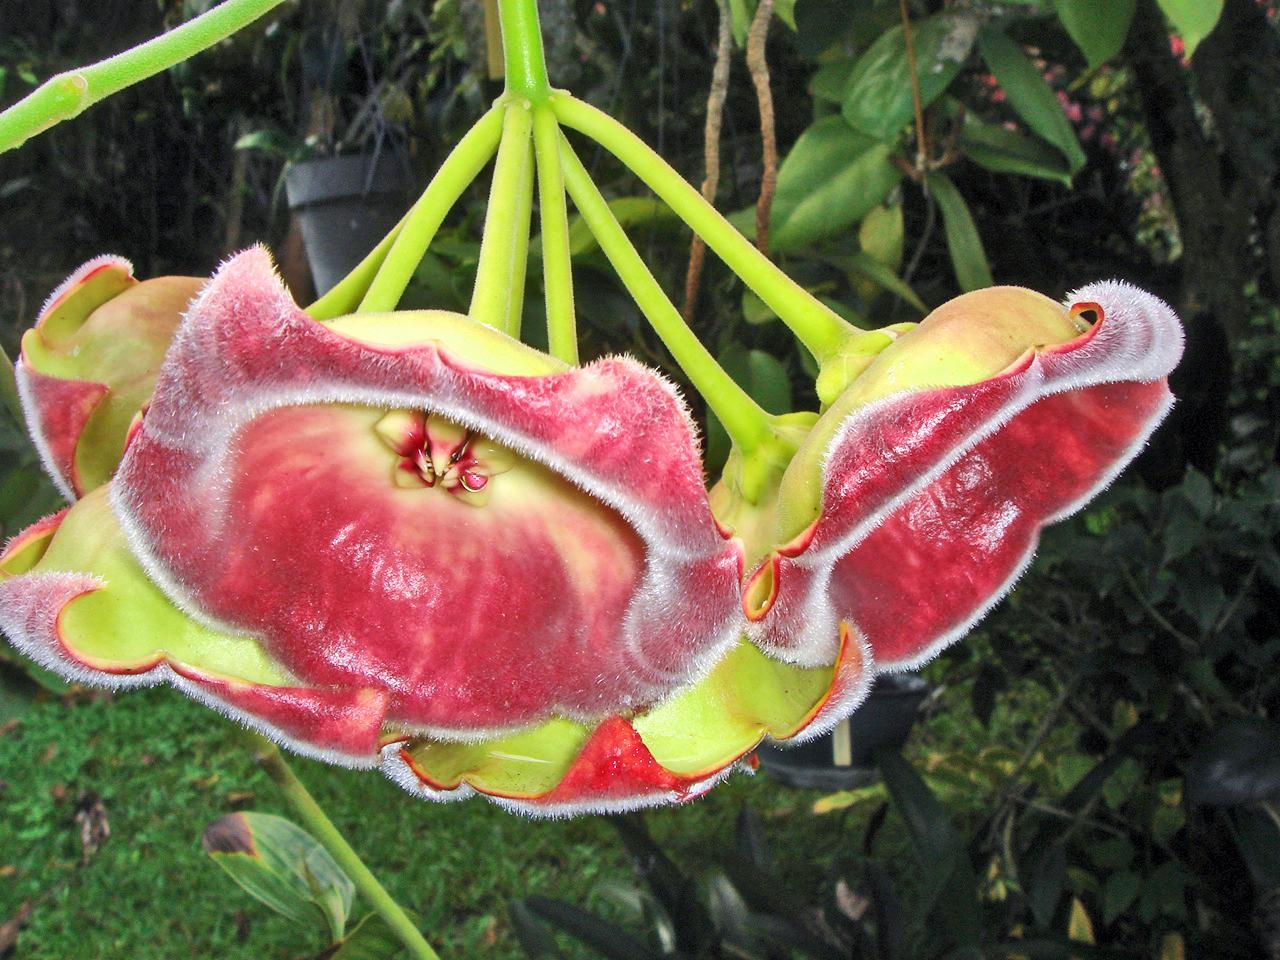 Hoya carnosa - Flor da Planta de Cera Lazuterbachii